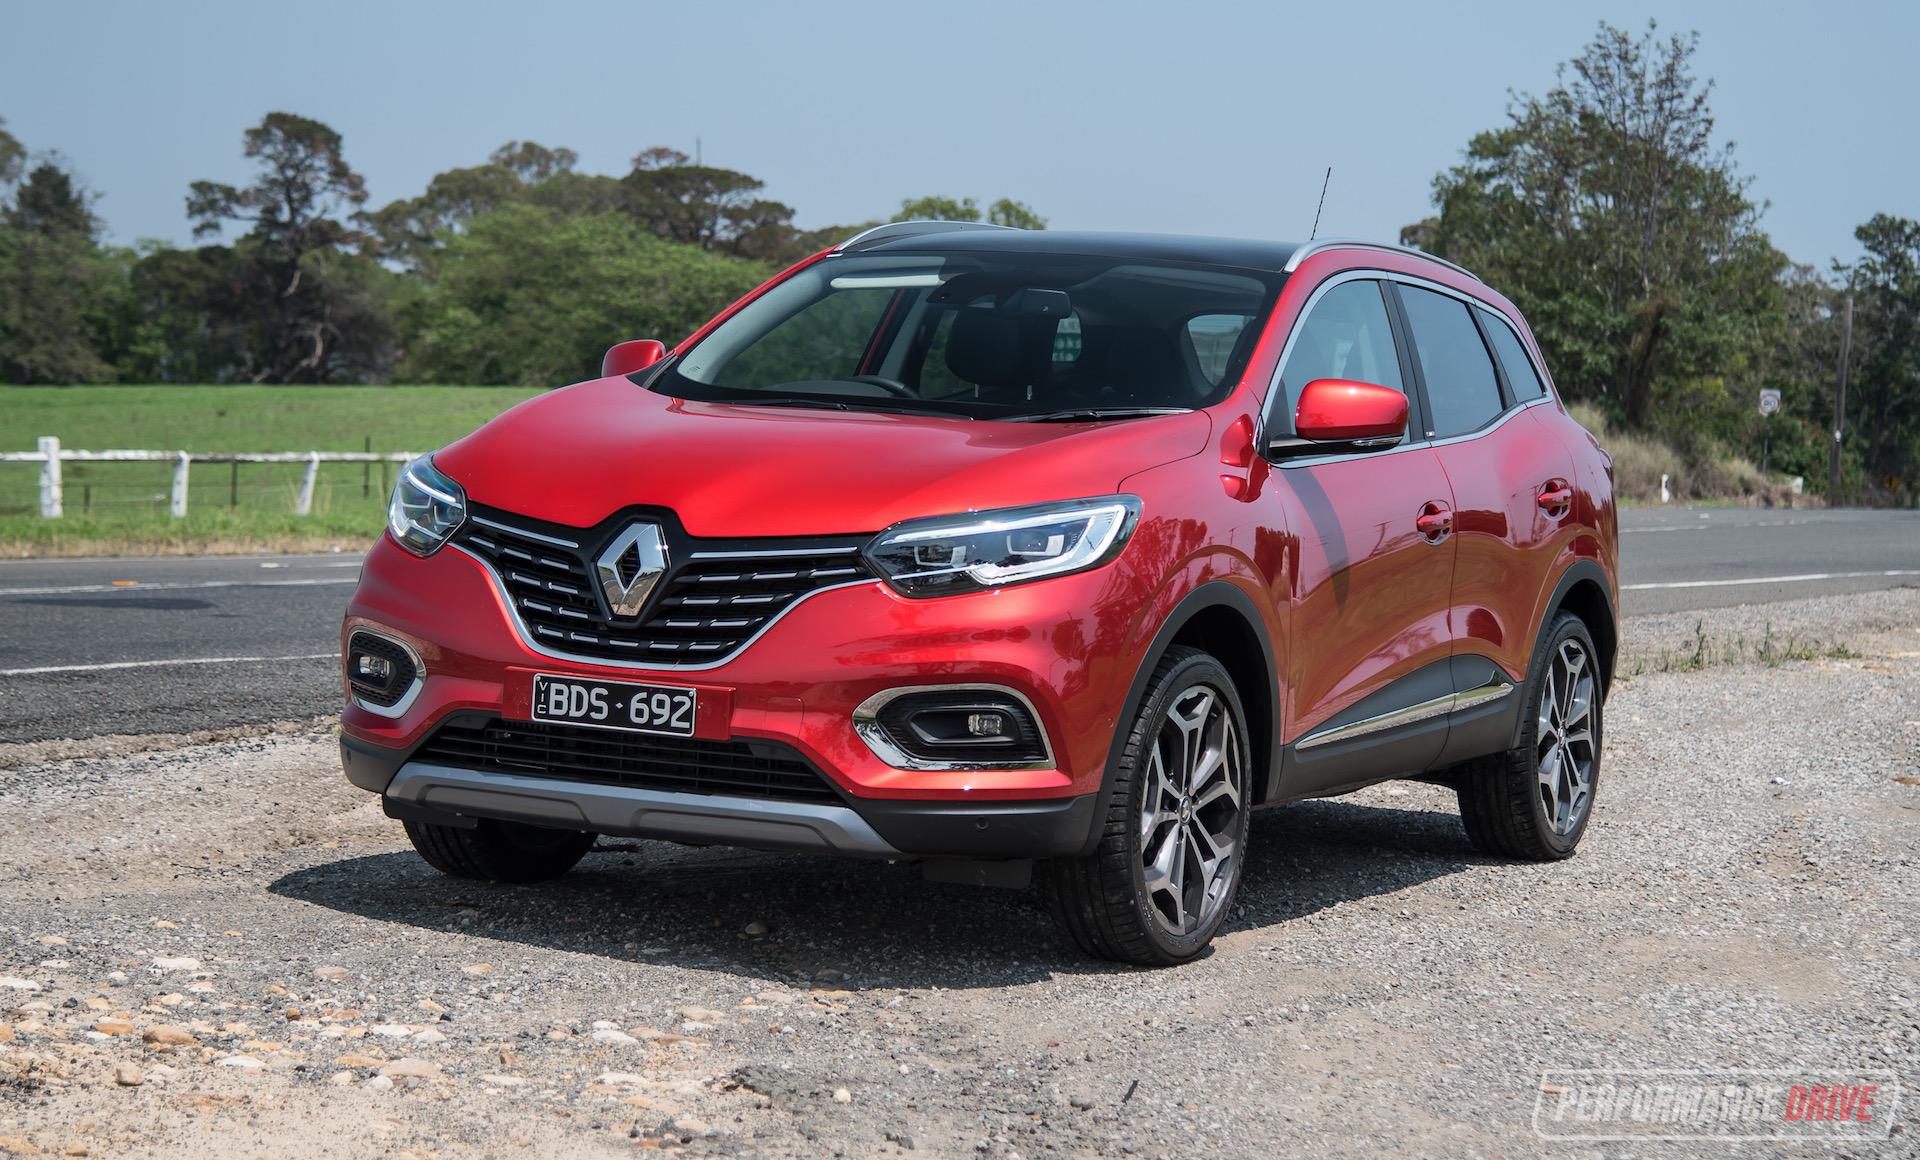 2020 Renault Kadjar Intens review (video) | PerformanceDrive